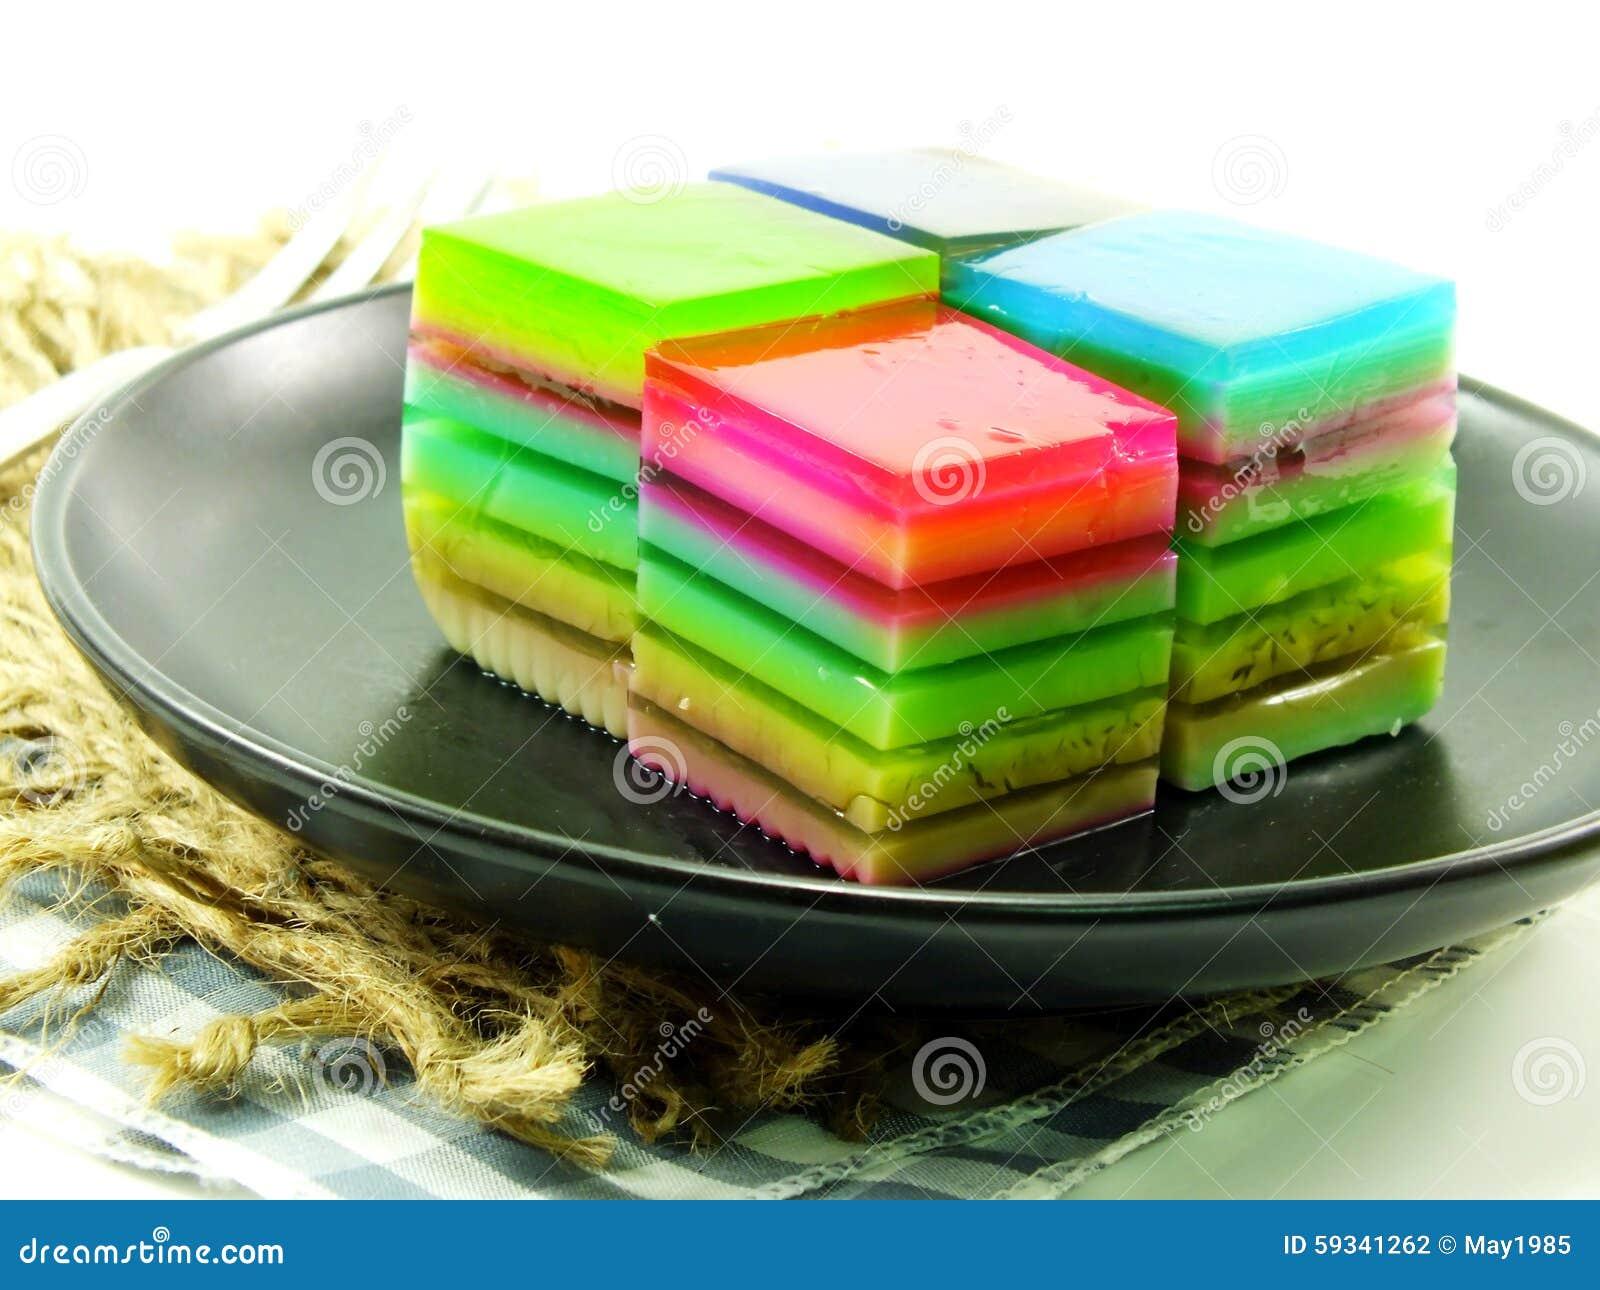 Sweet colorful treat of rainbow layered gelatin dessert